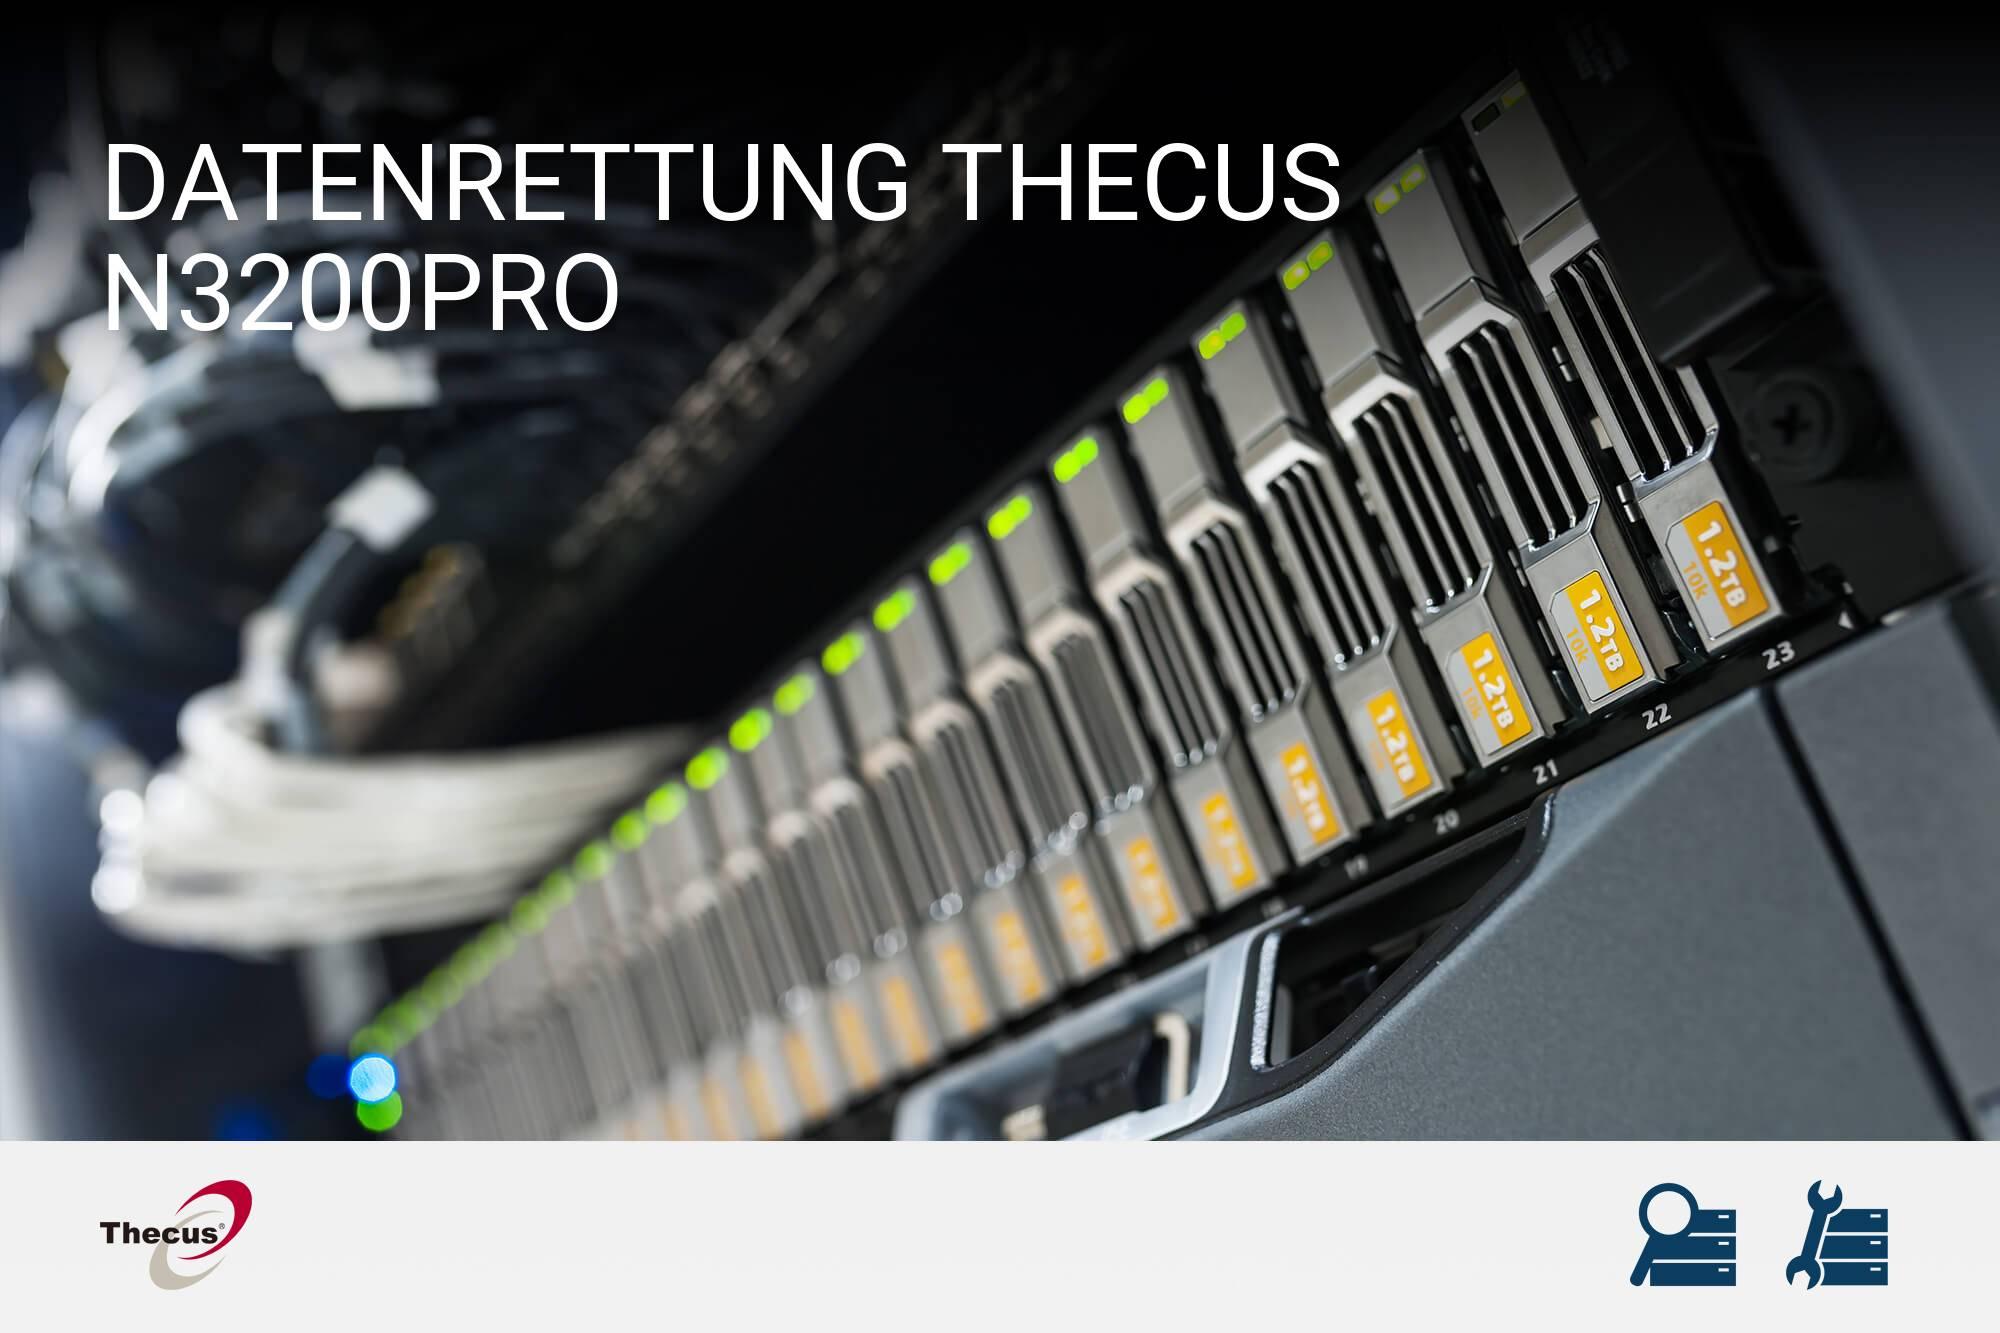 Thecus N3200PRO